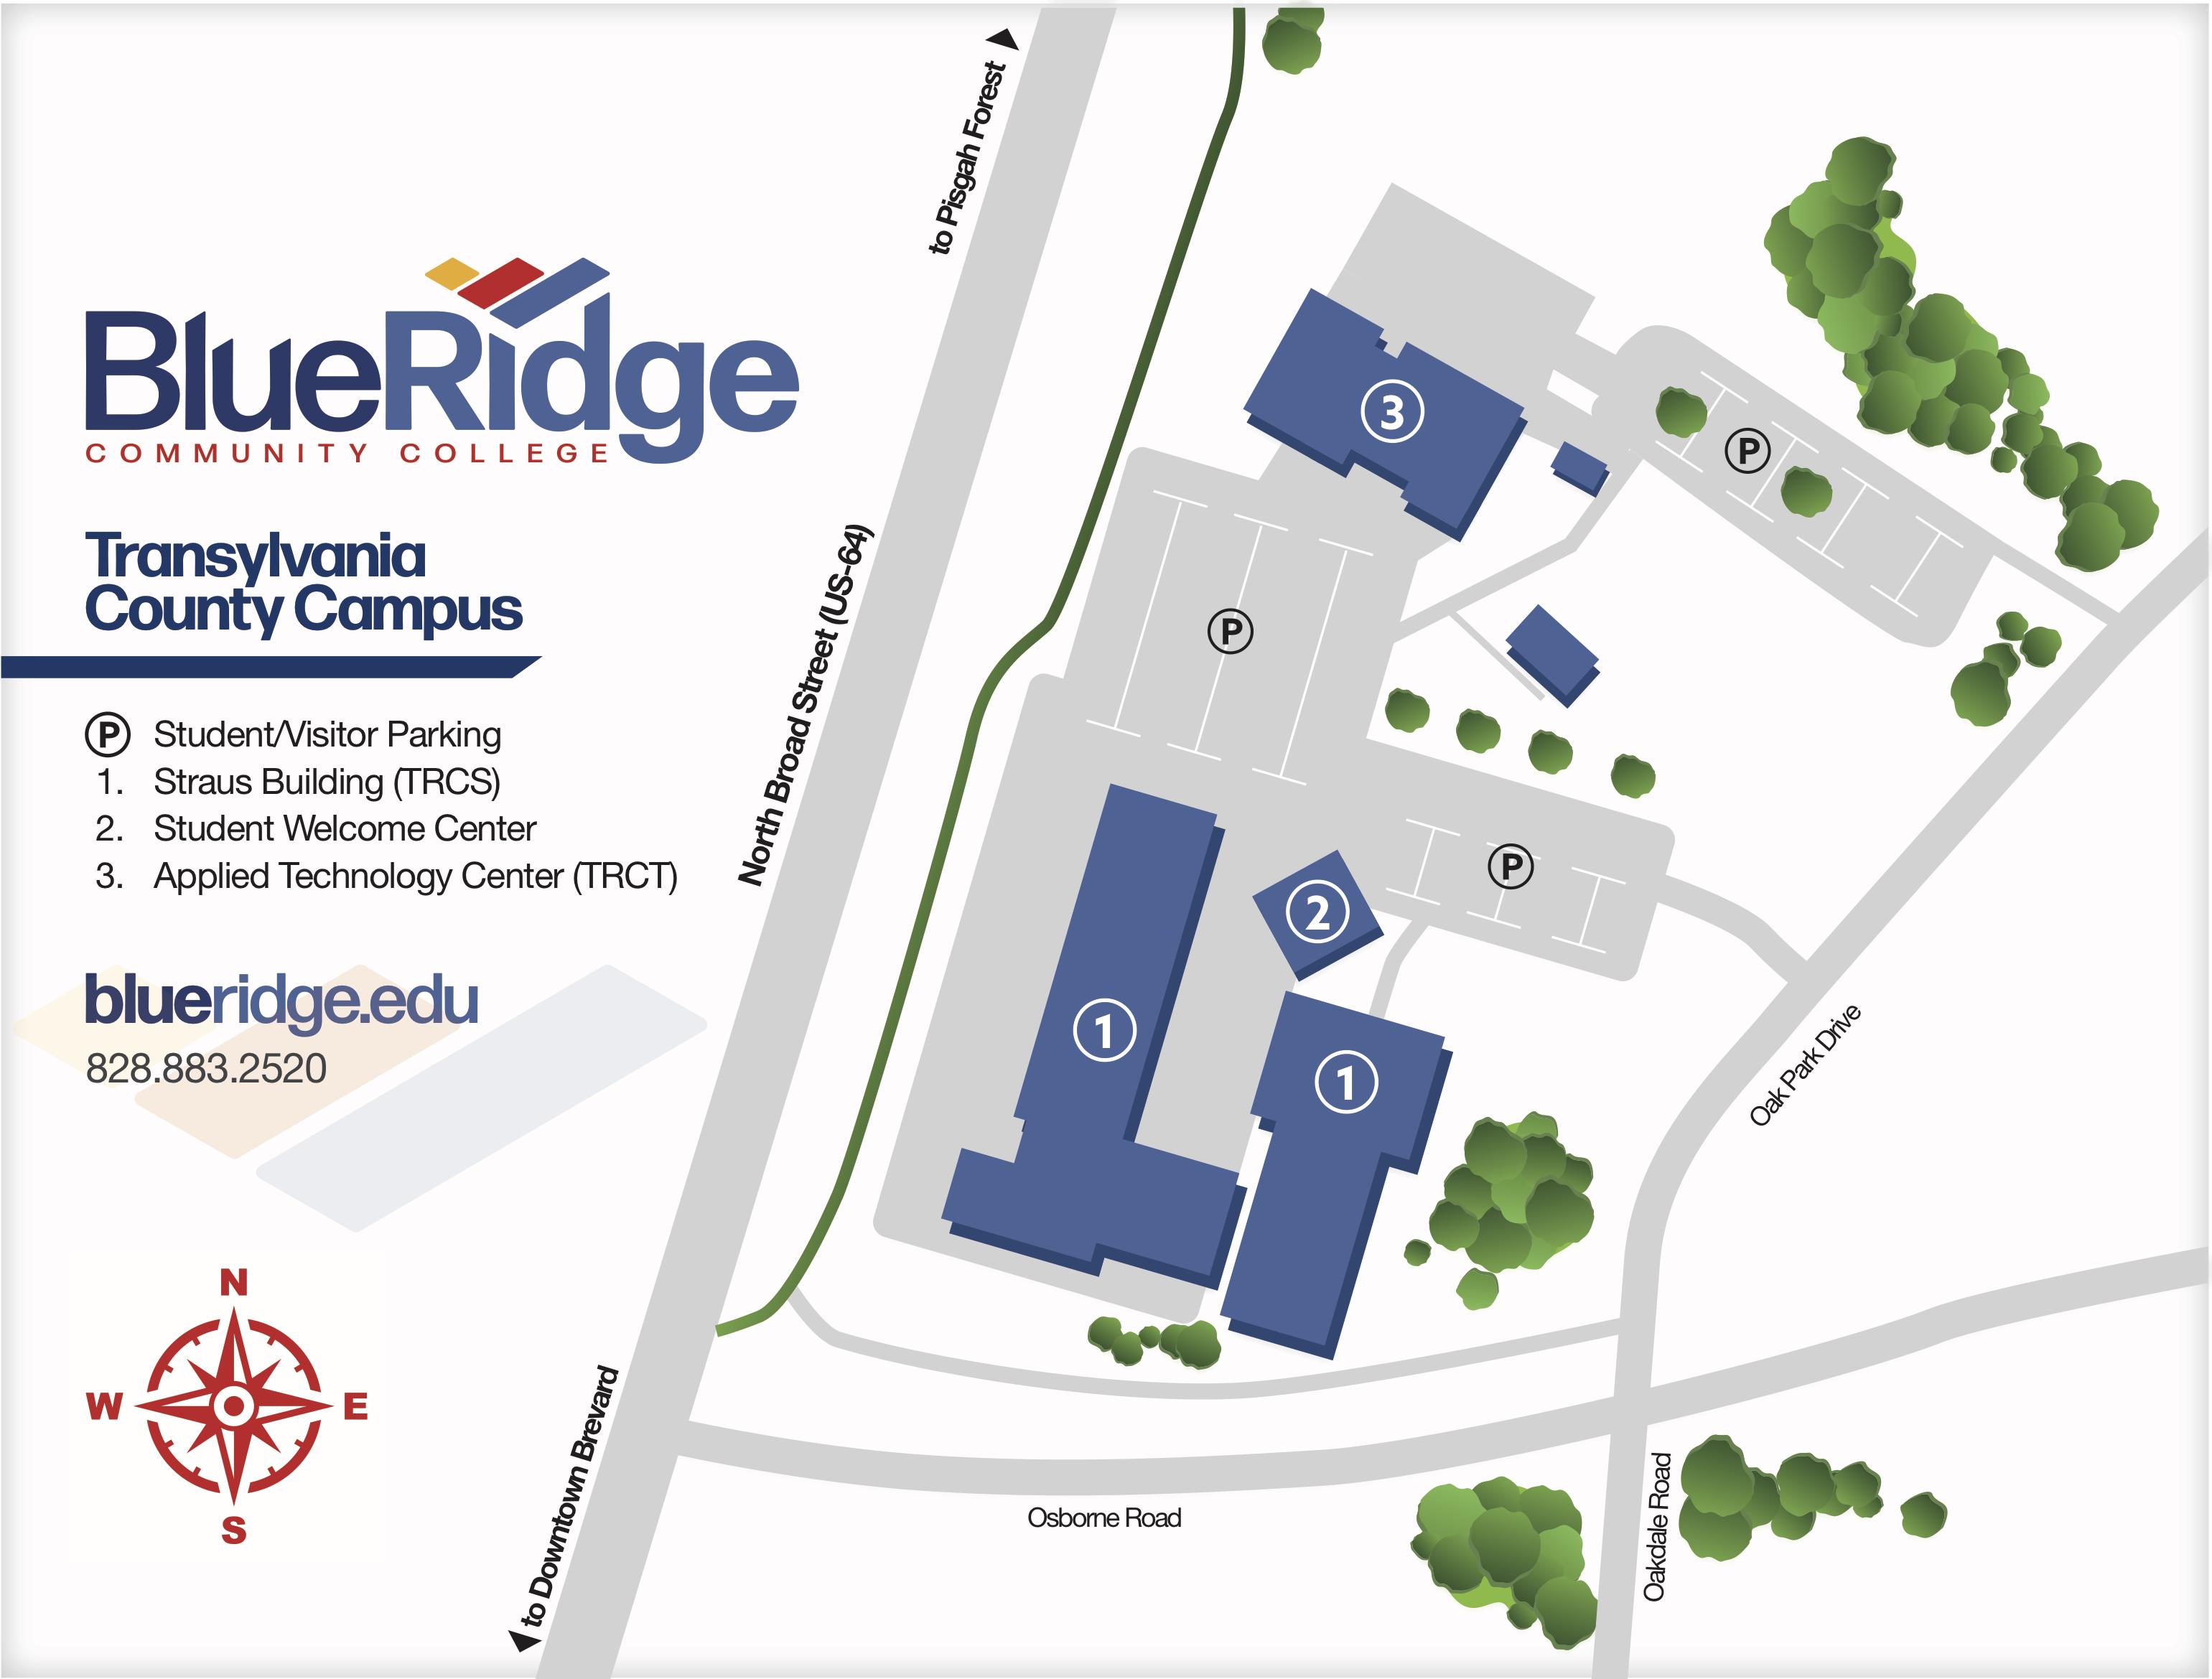 Blue Ridge Community College Transylvania County Campus Map